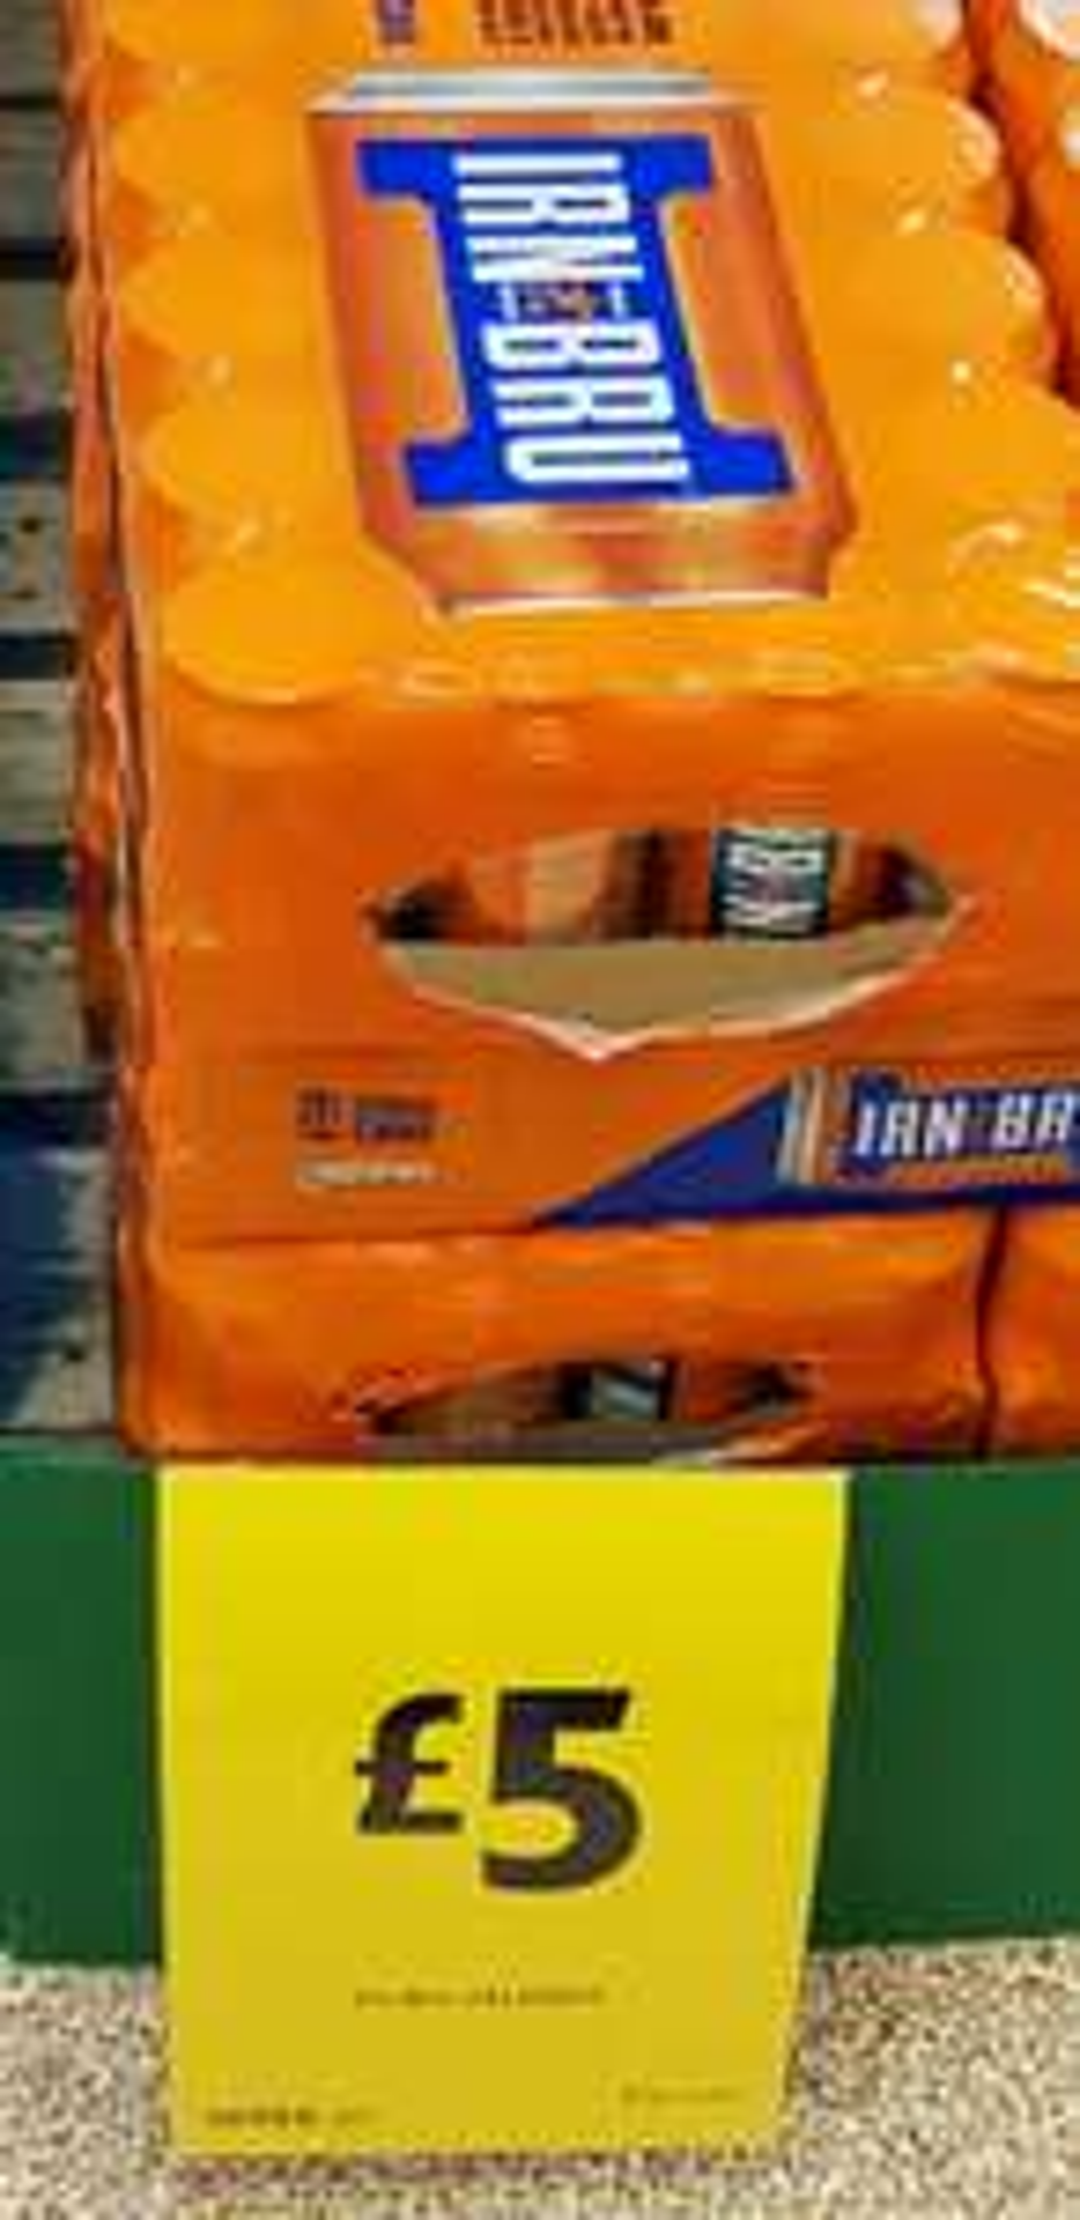 Irn Bru 24 Pack, £5 Instore Only @ Morrisons